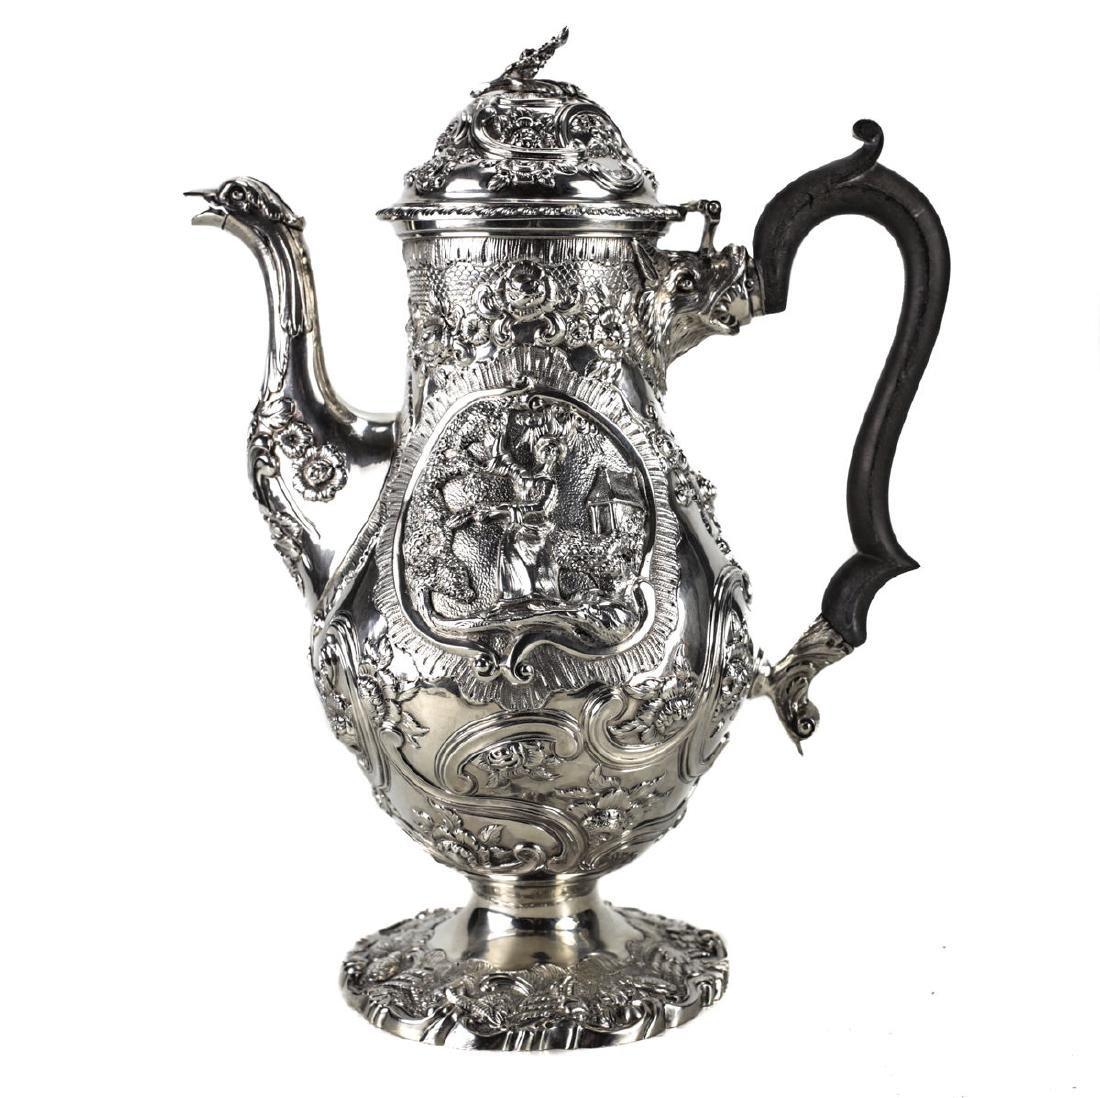 A Regency Sterling Silver Coffee Pot by William